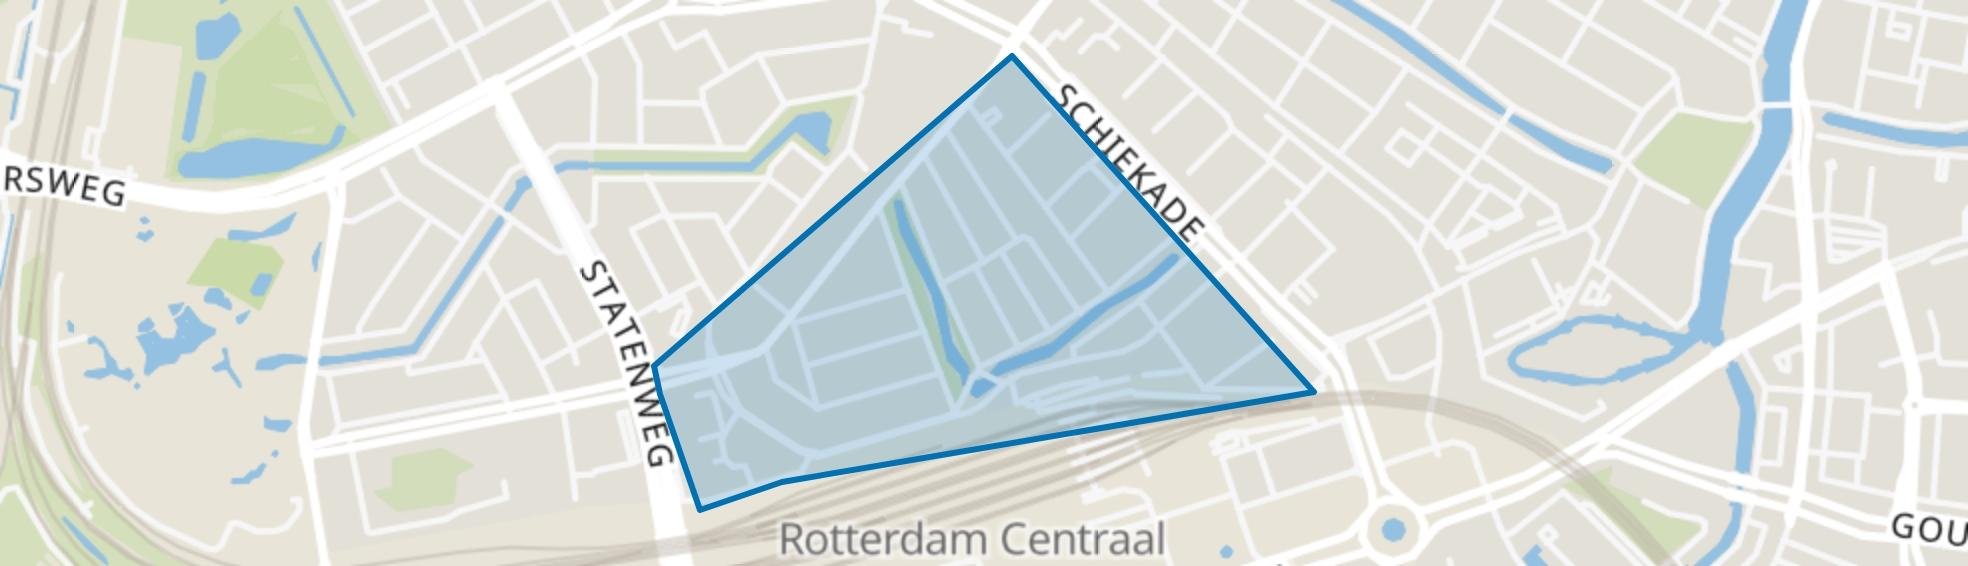 Provenierswijk, Rotterdam map